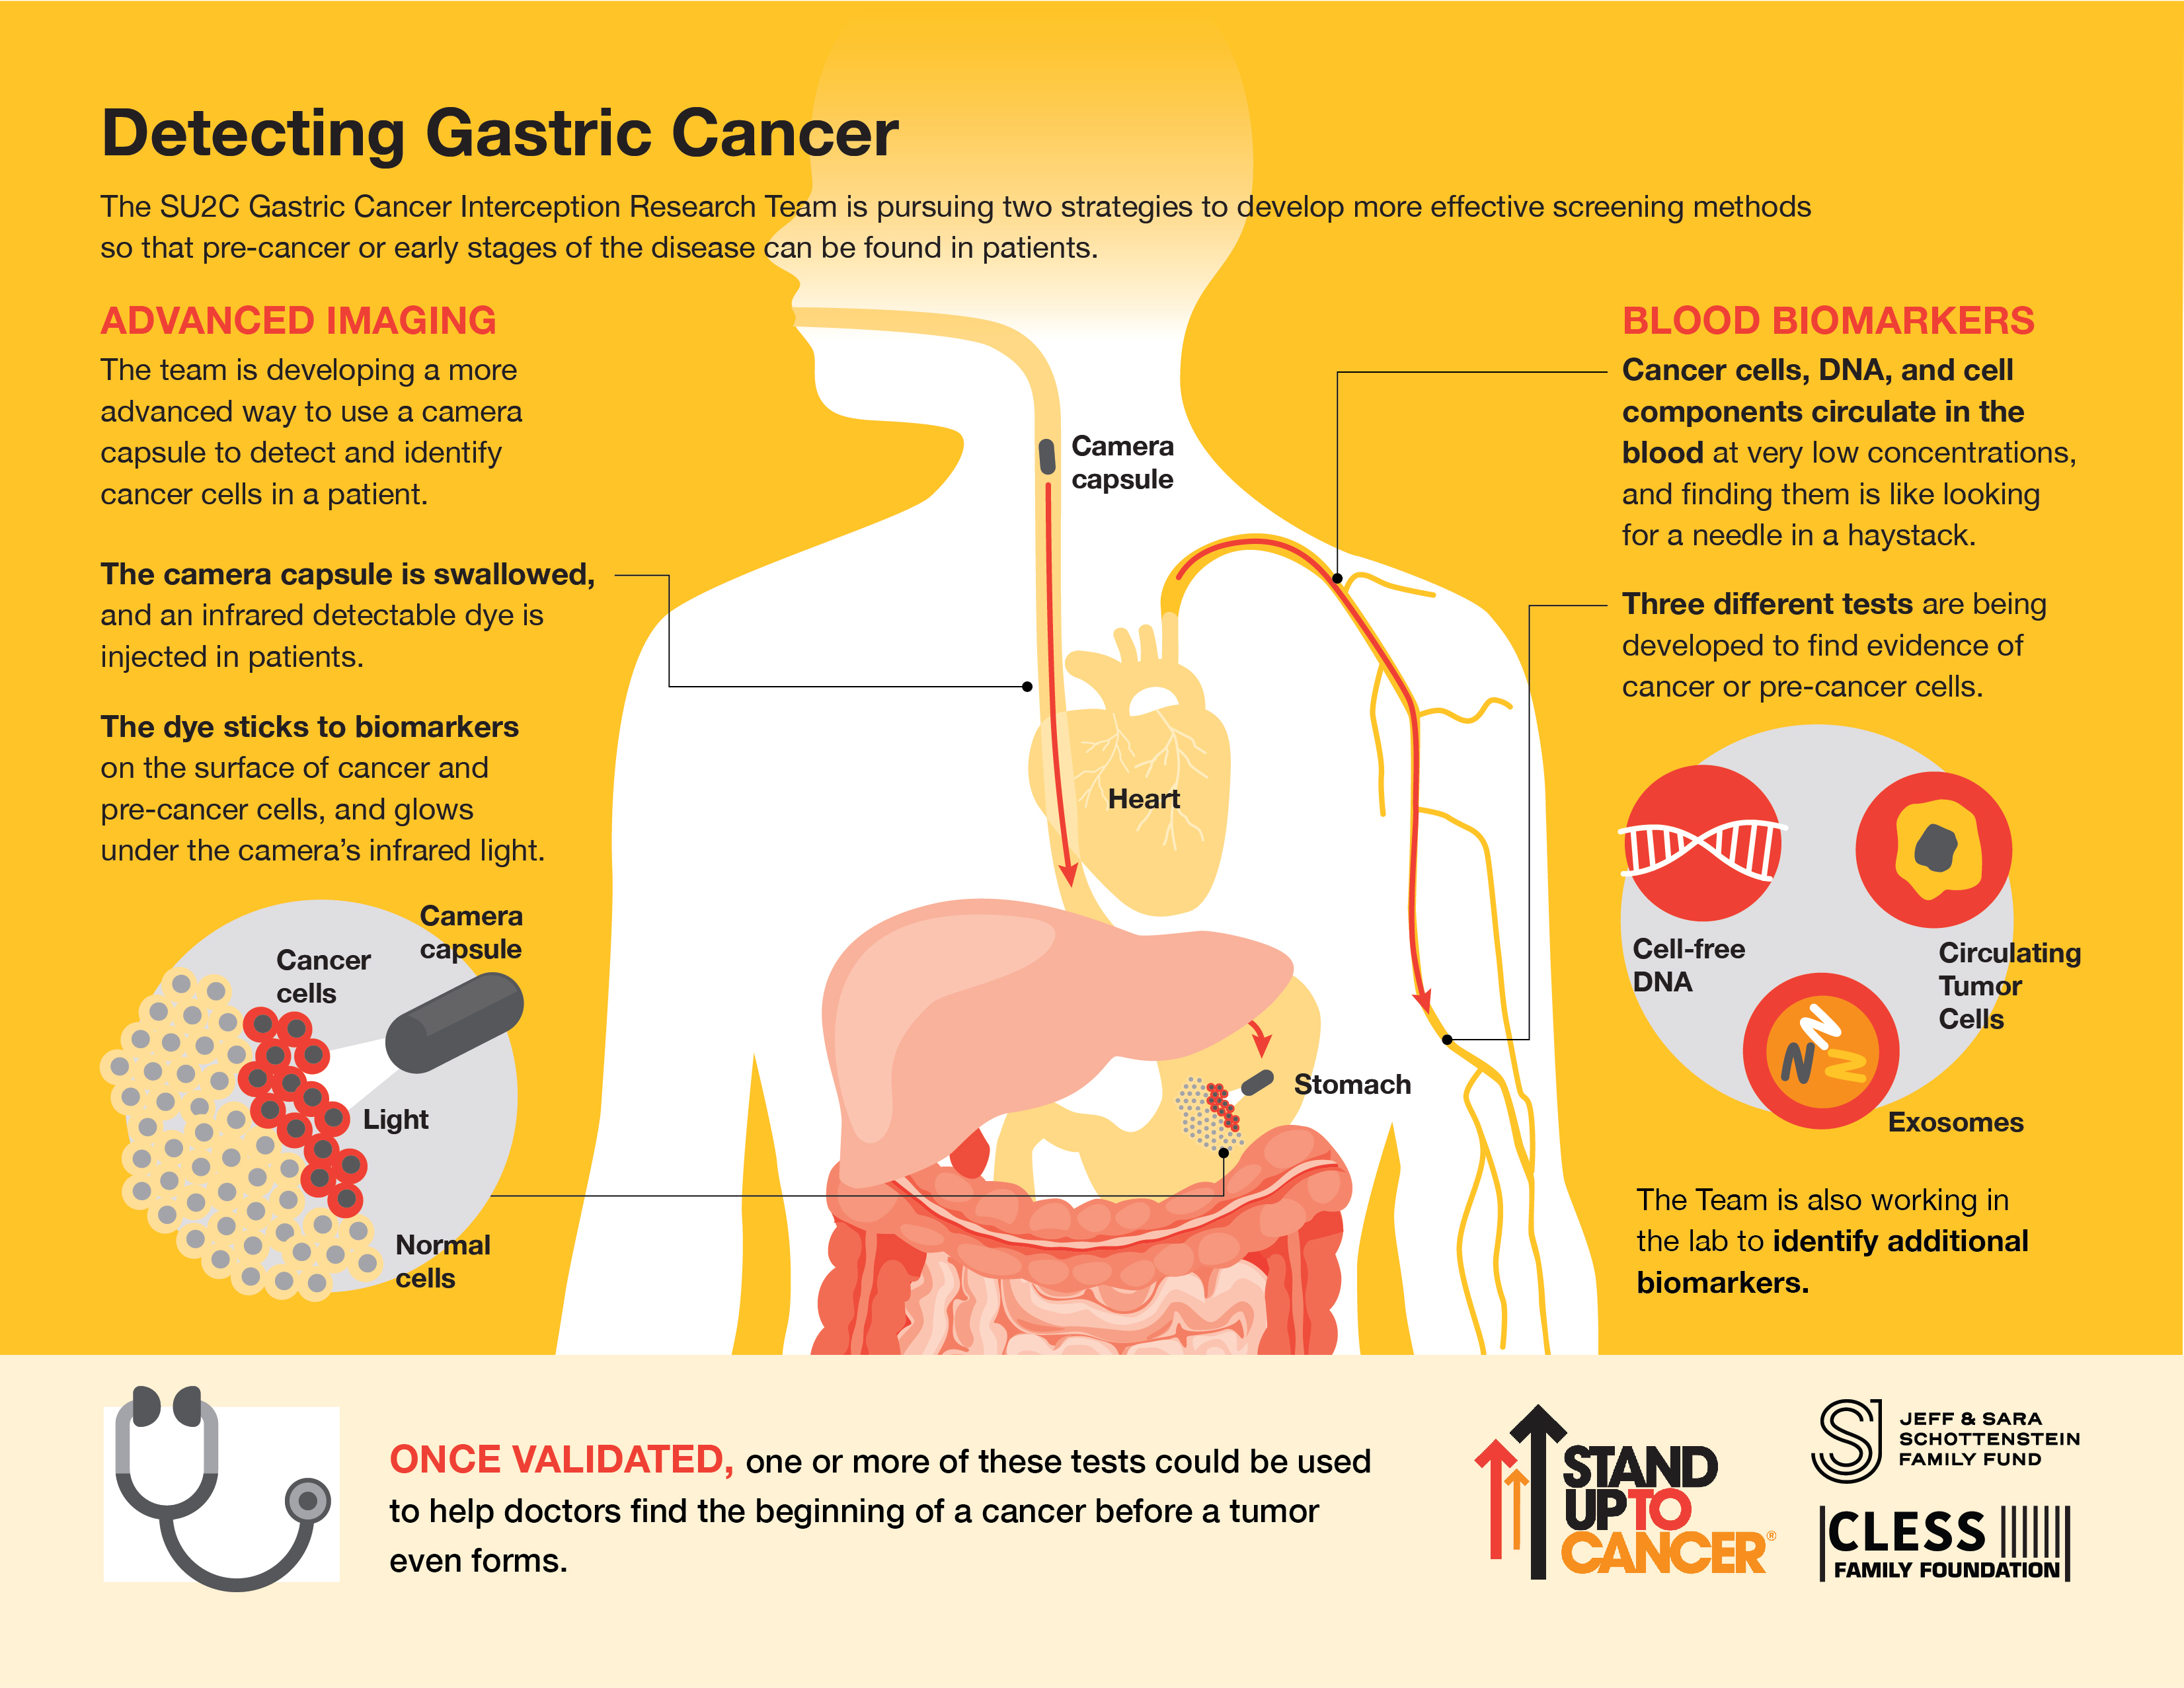 Ce trebuie sa stim despre cancerul gastric